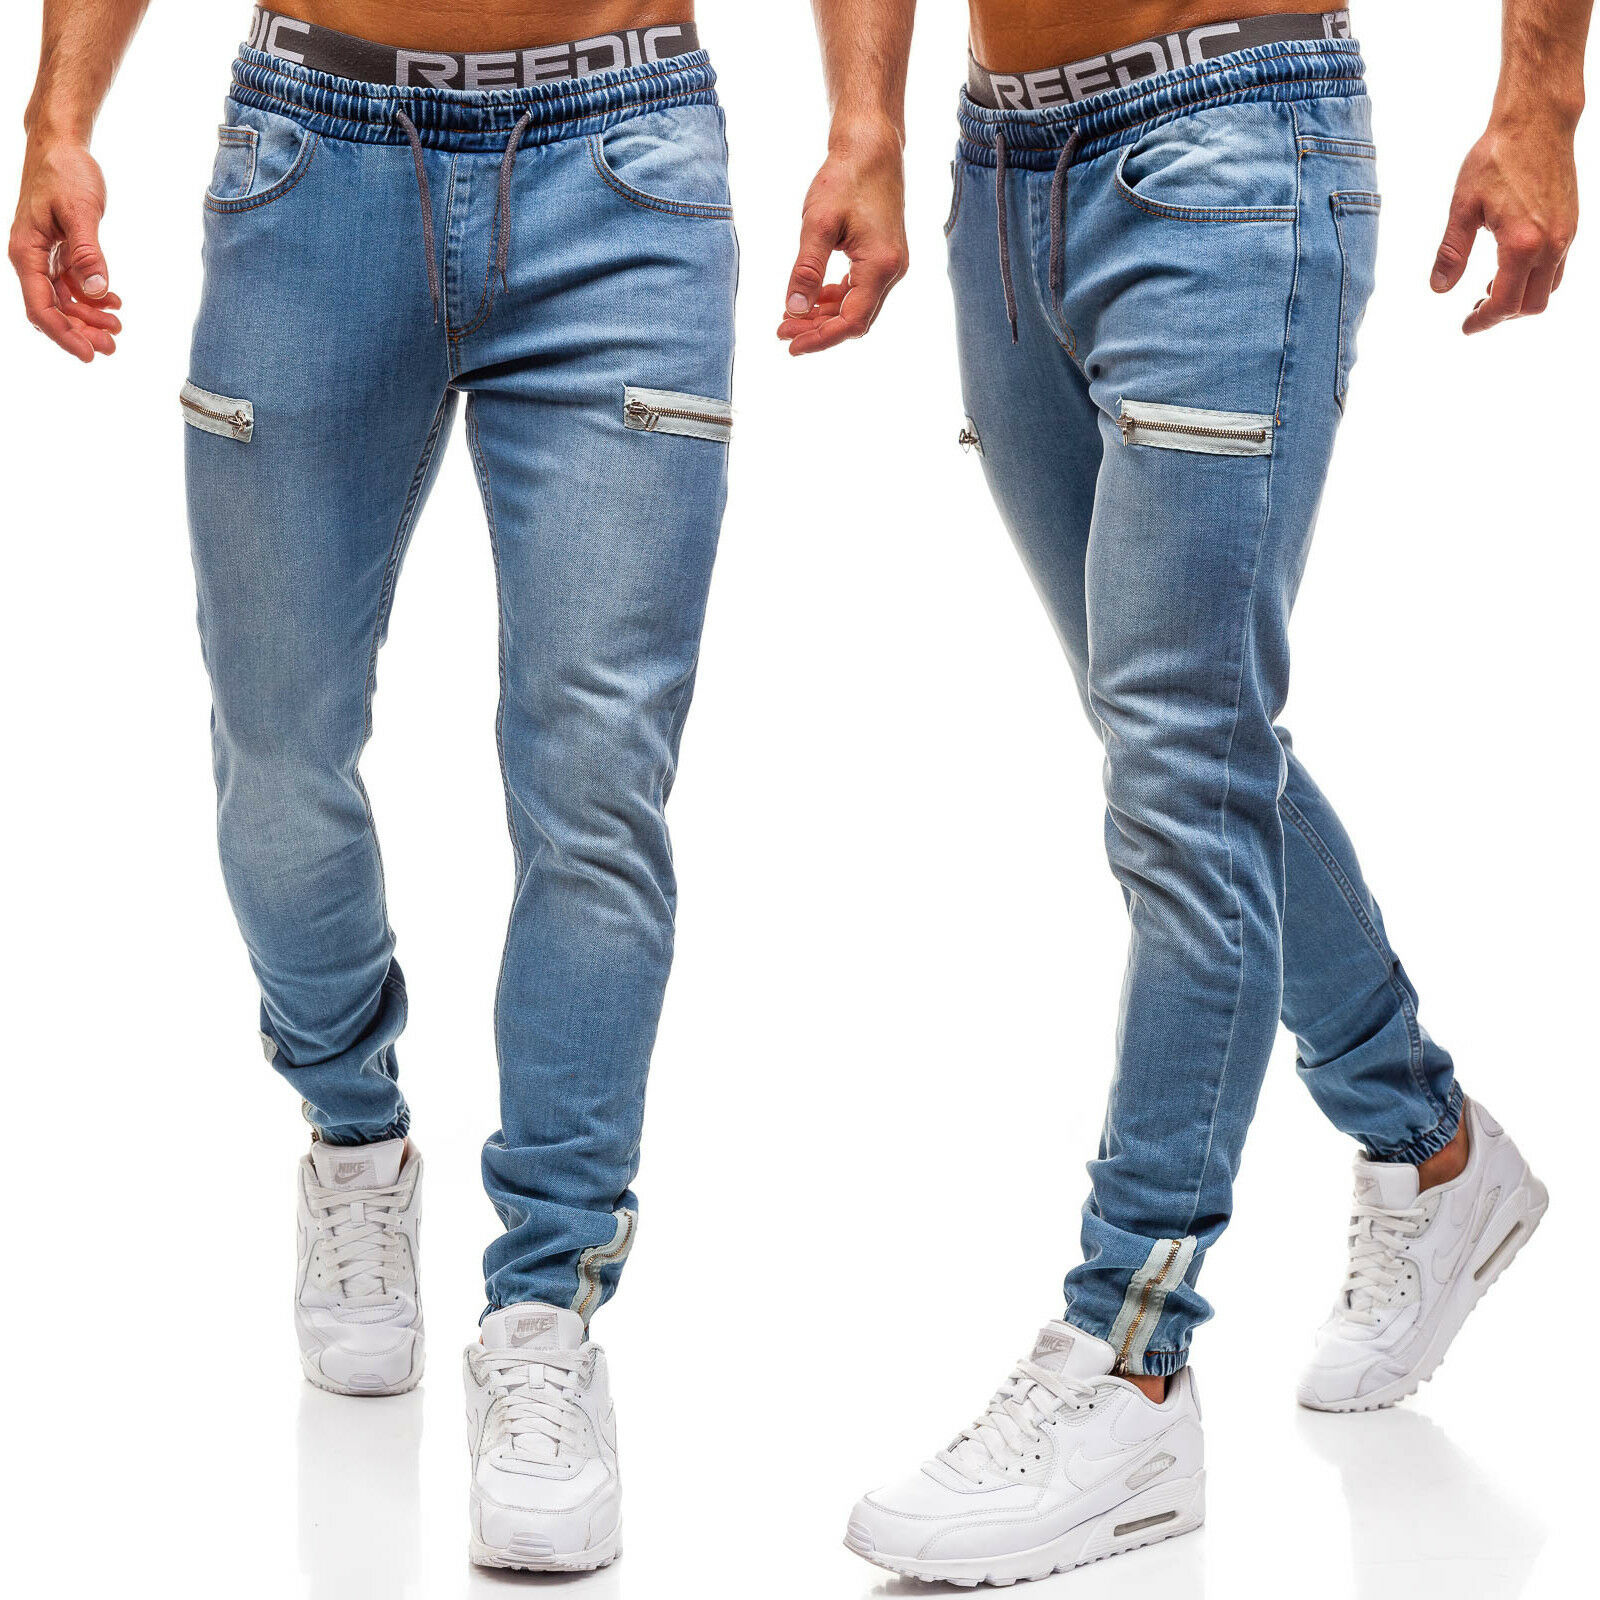 Hot Selling Europe And America Men Jean Fabric Casual Dull Polish Zipper Design Sports Jeans Men's T354